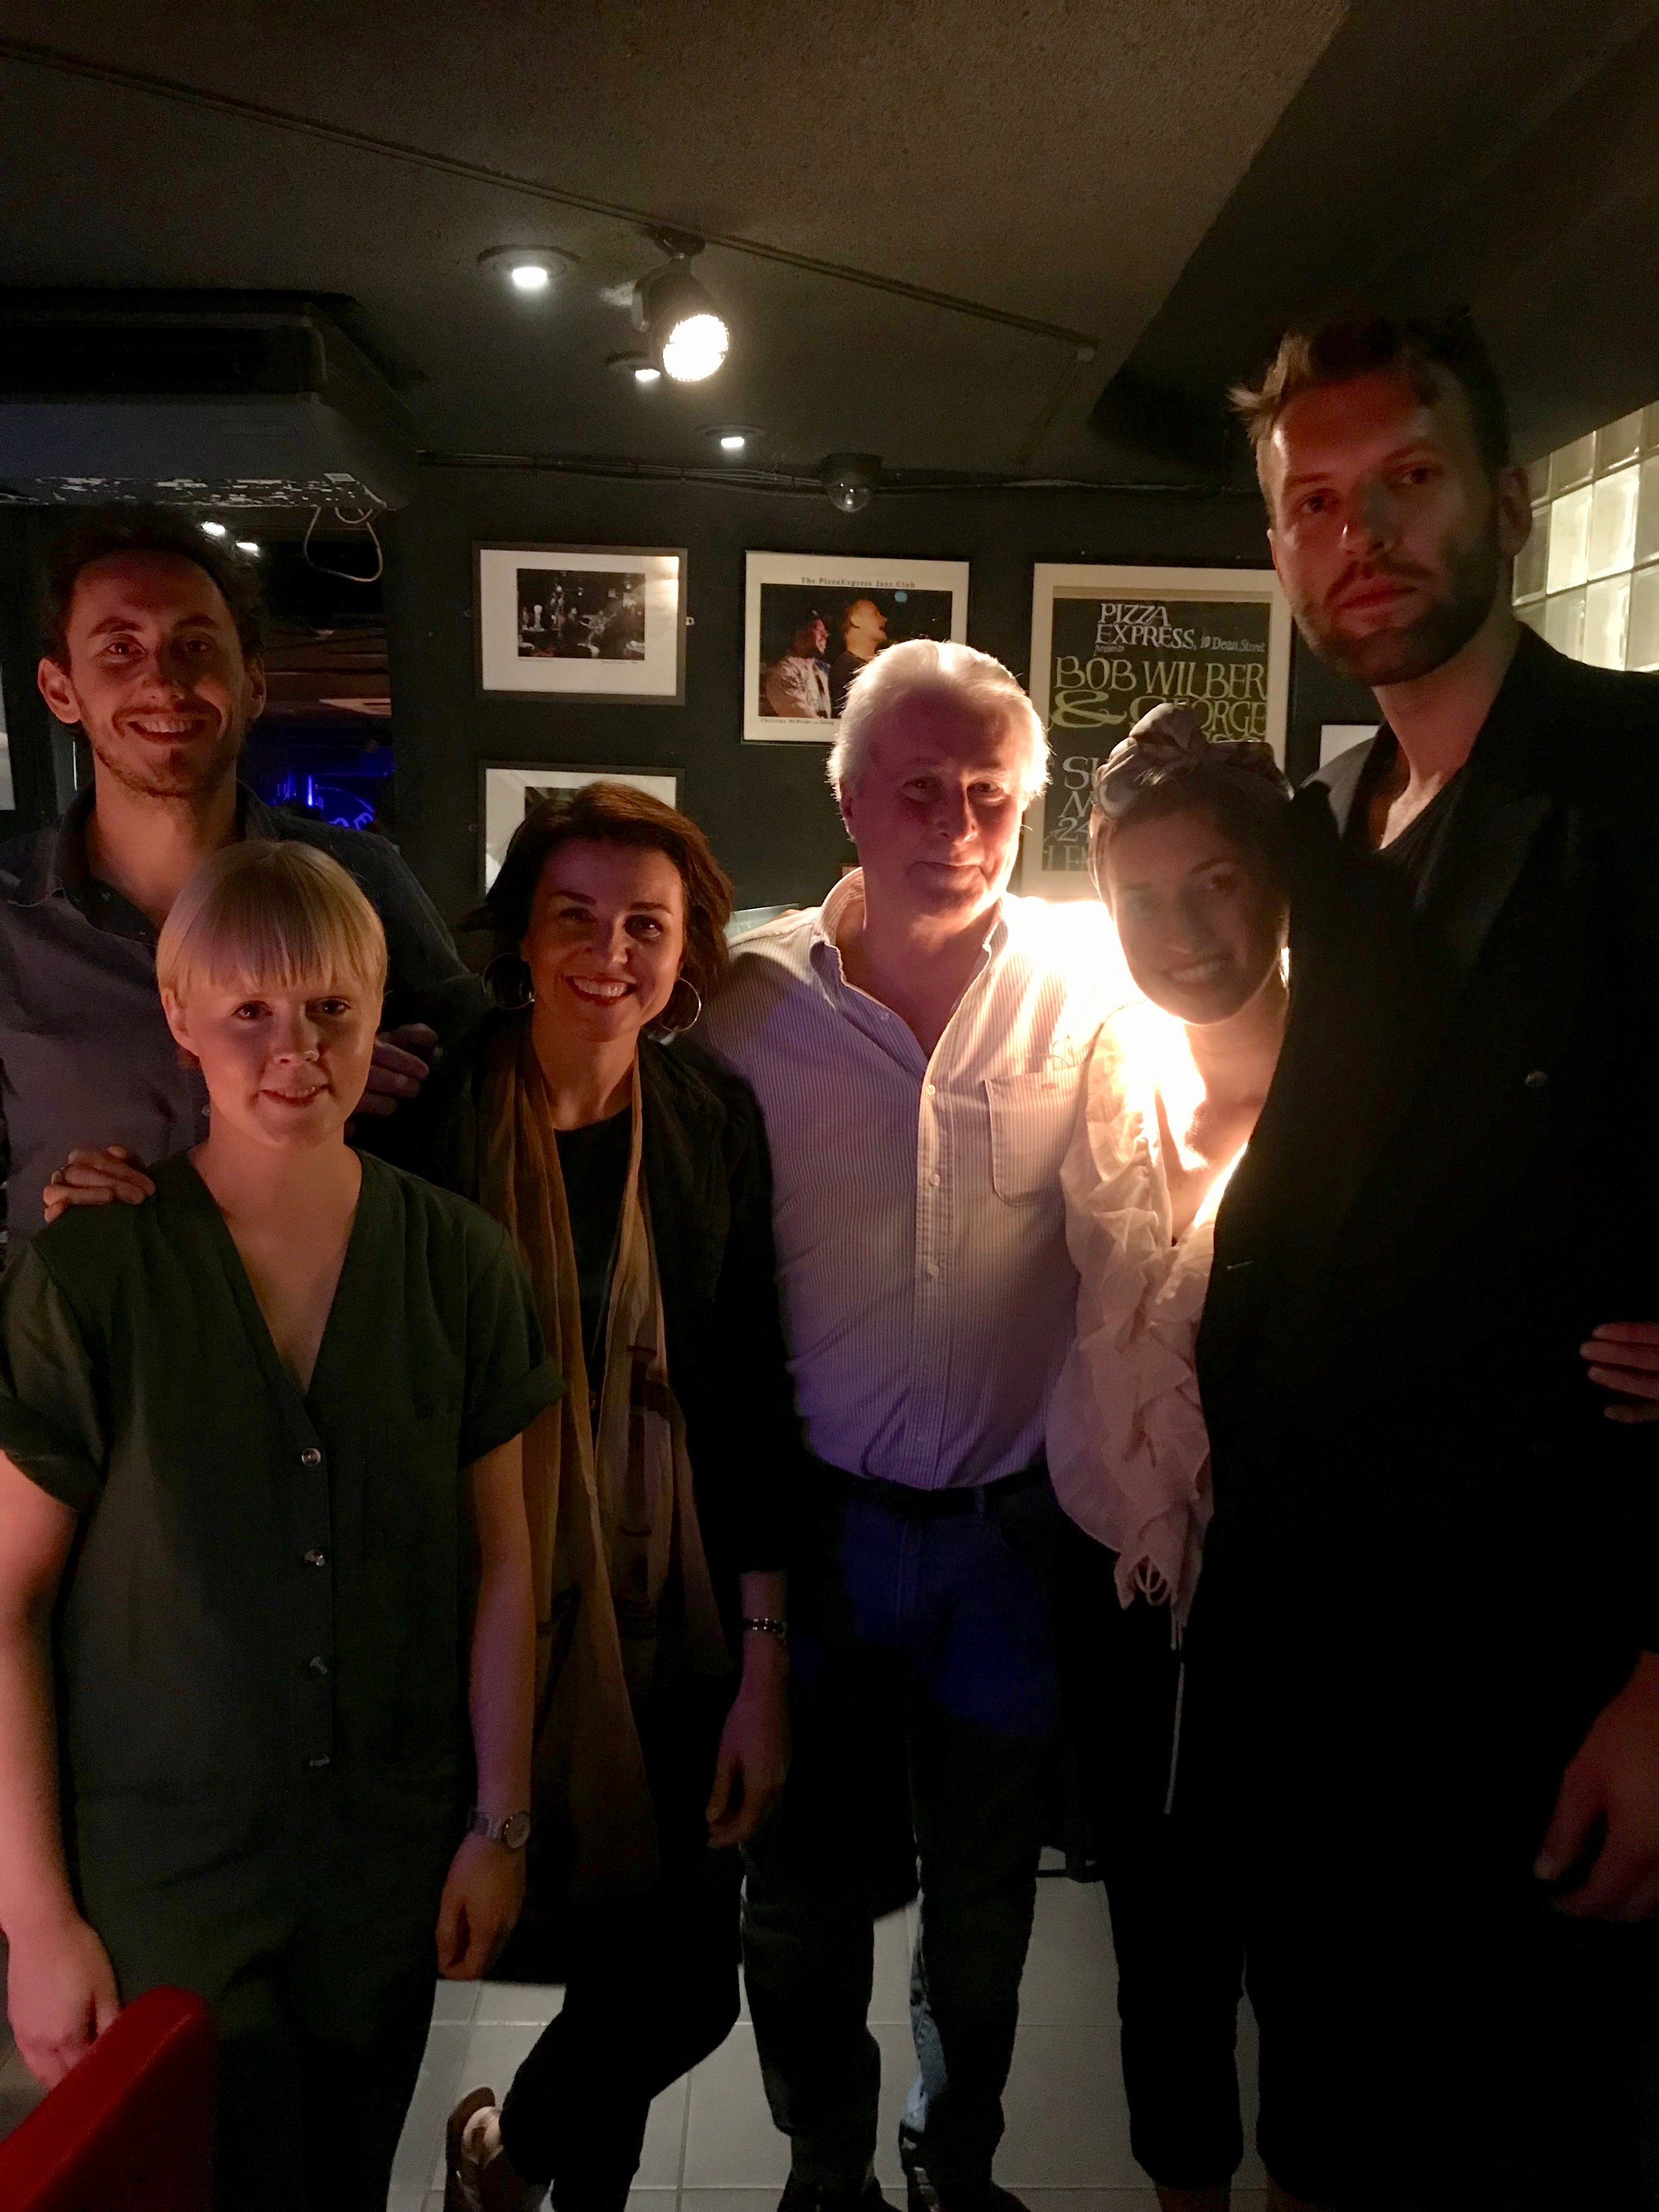 Left to Right: Alex Munk, Helena Kay, Alina Bzhezhinska, Martin Hummel, Jessica Radcliffe, Nick Costley-White.